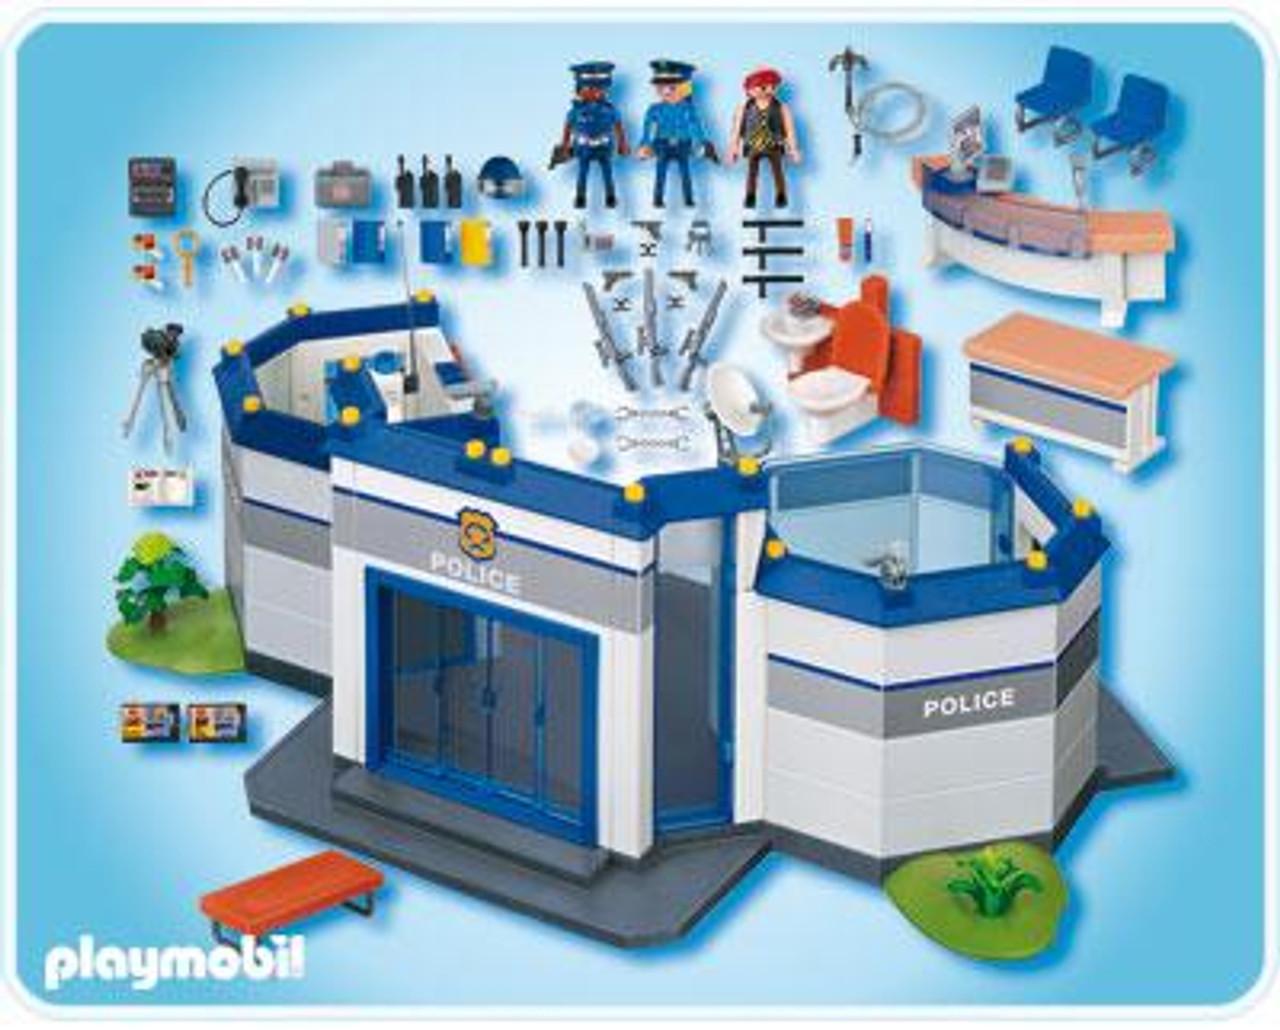 playmobil police headquarters set 4264 toywiz. Black Bedroom Furniture Sets. Home Design Ideas